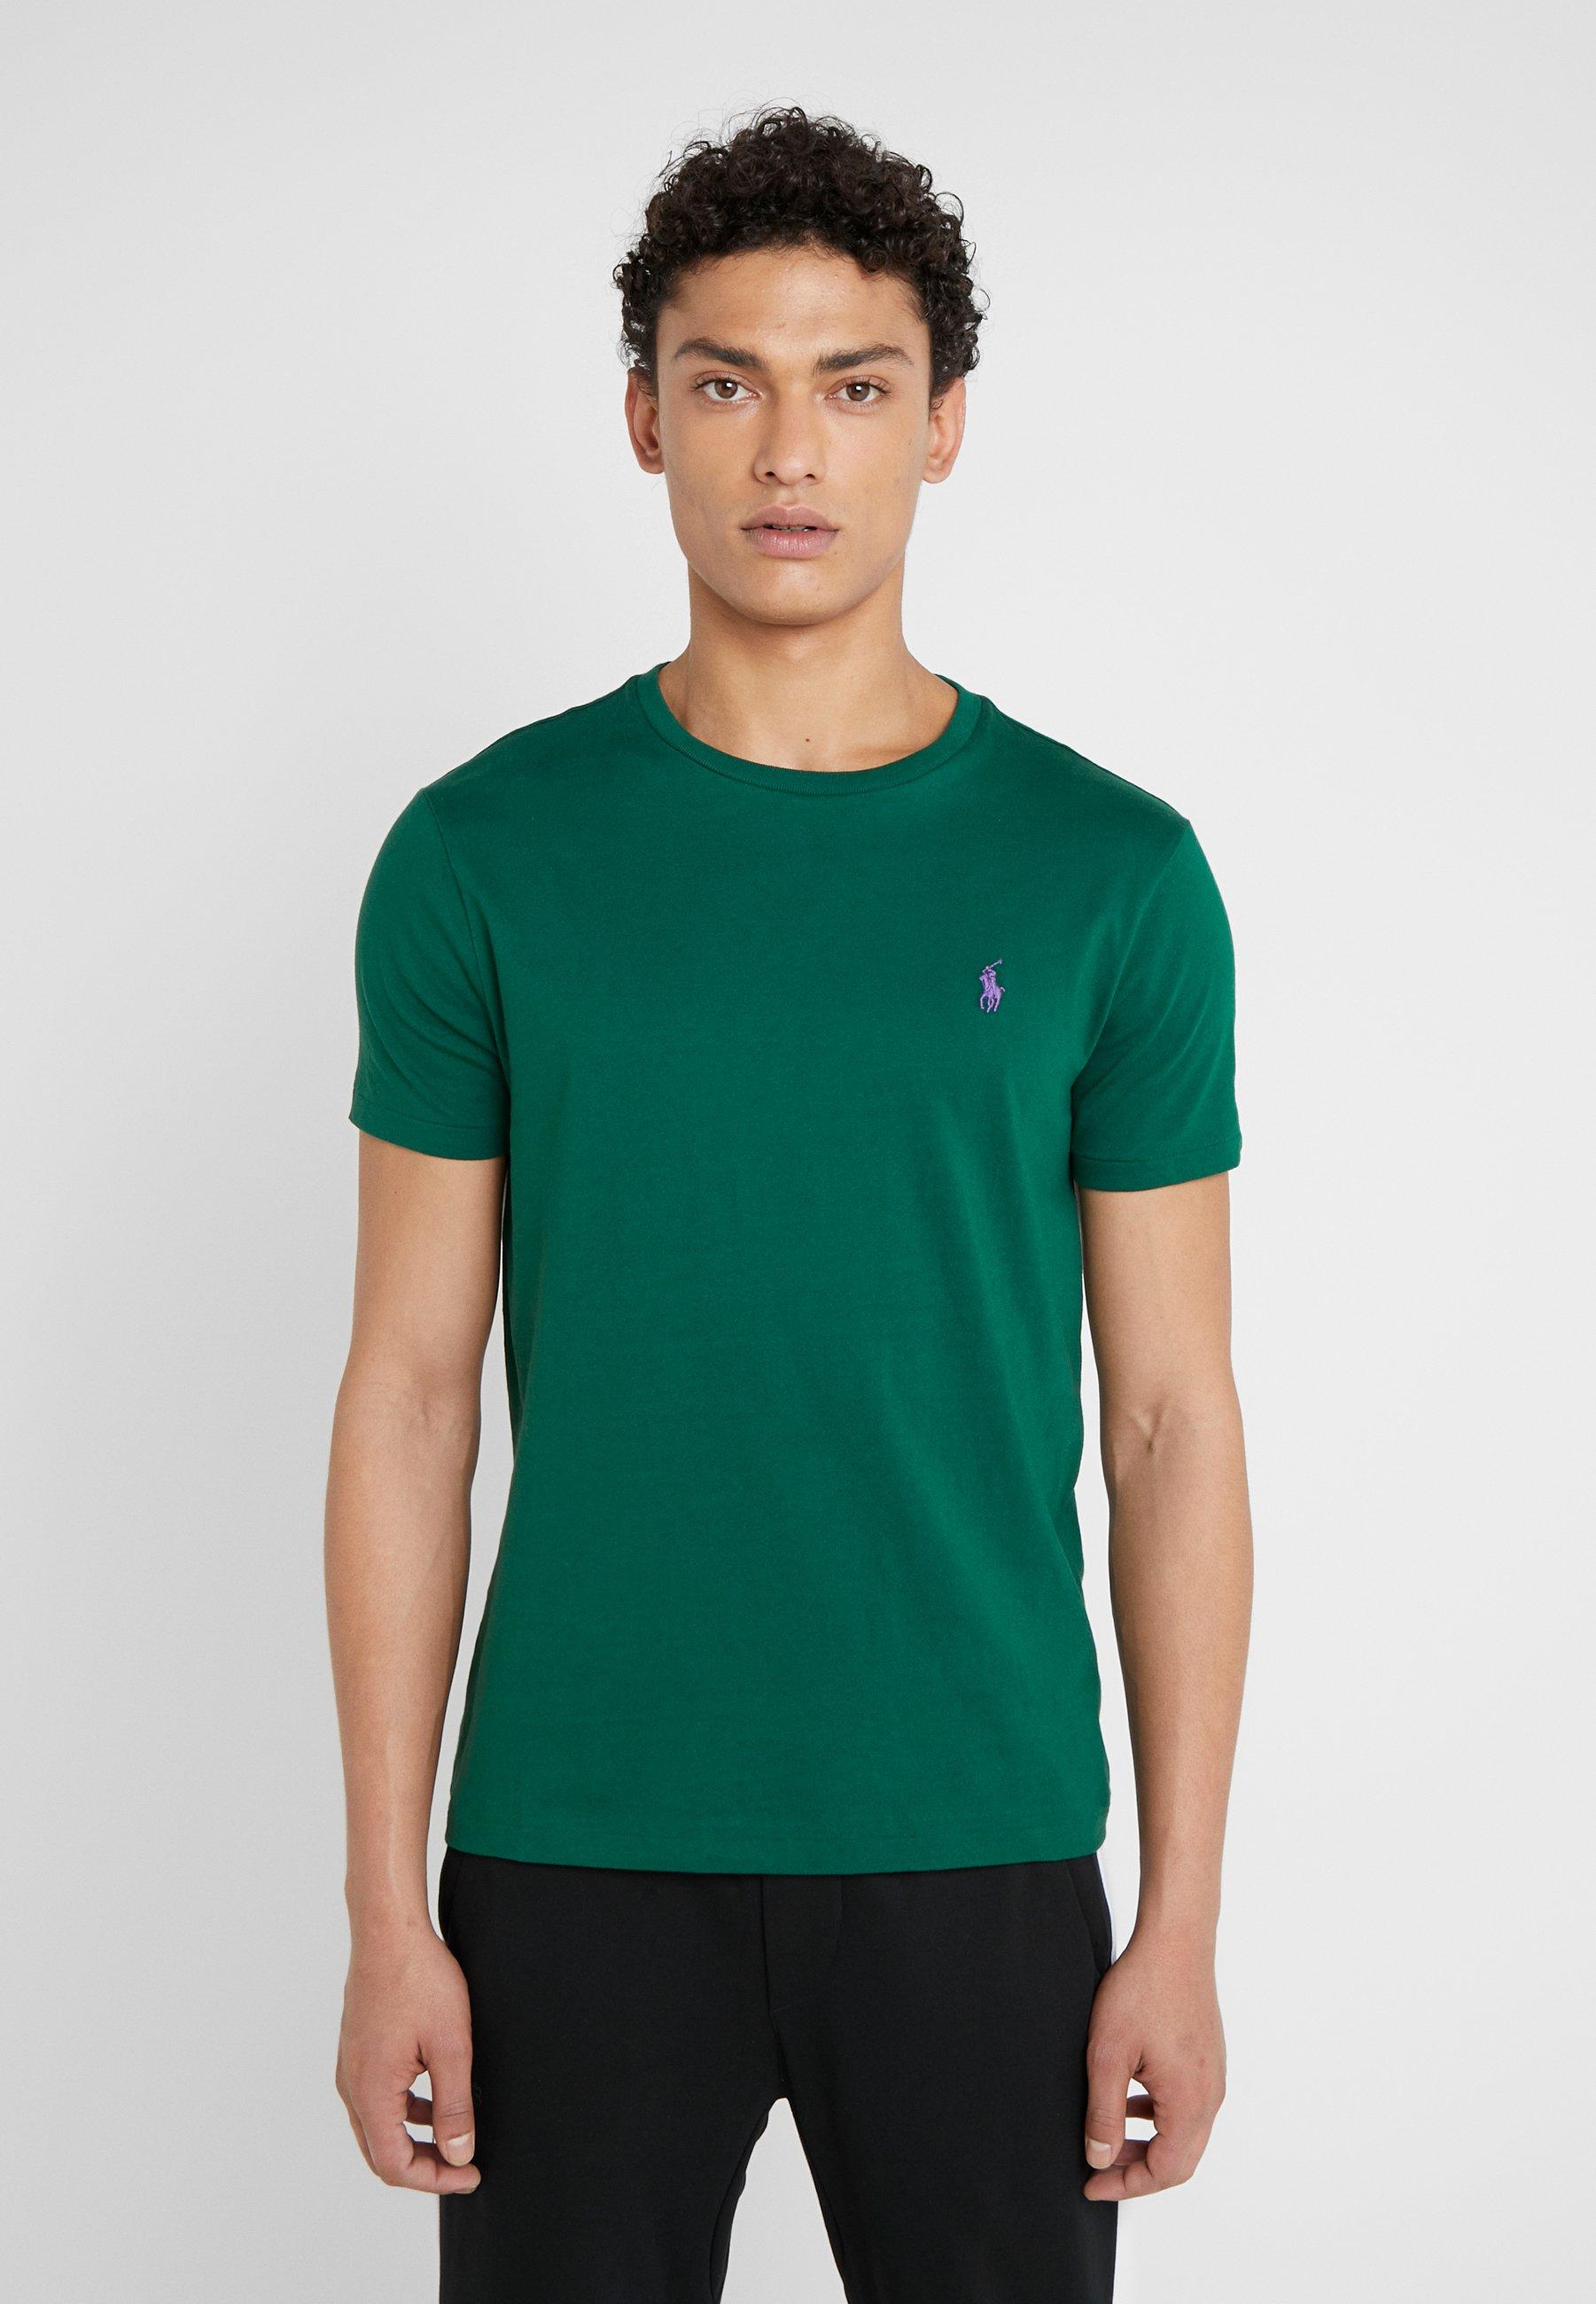 Men CUSTOM SLIM FIT JERSEY CREWNECK T-SHIRT - Basic T-shirt